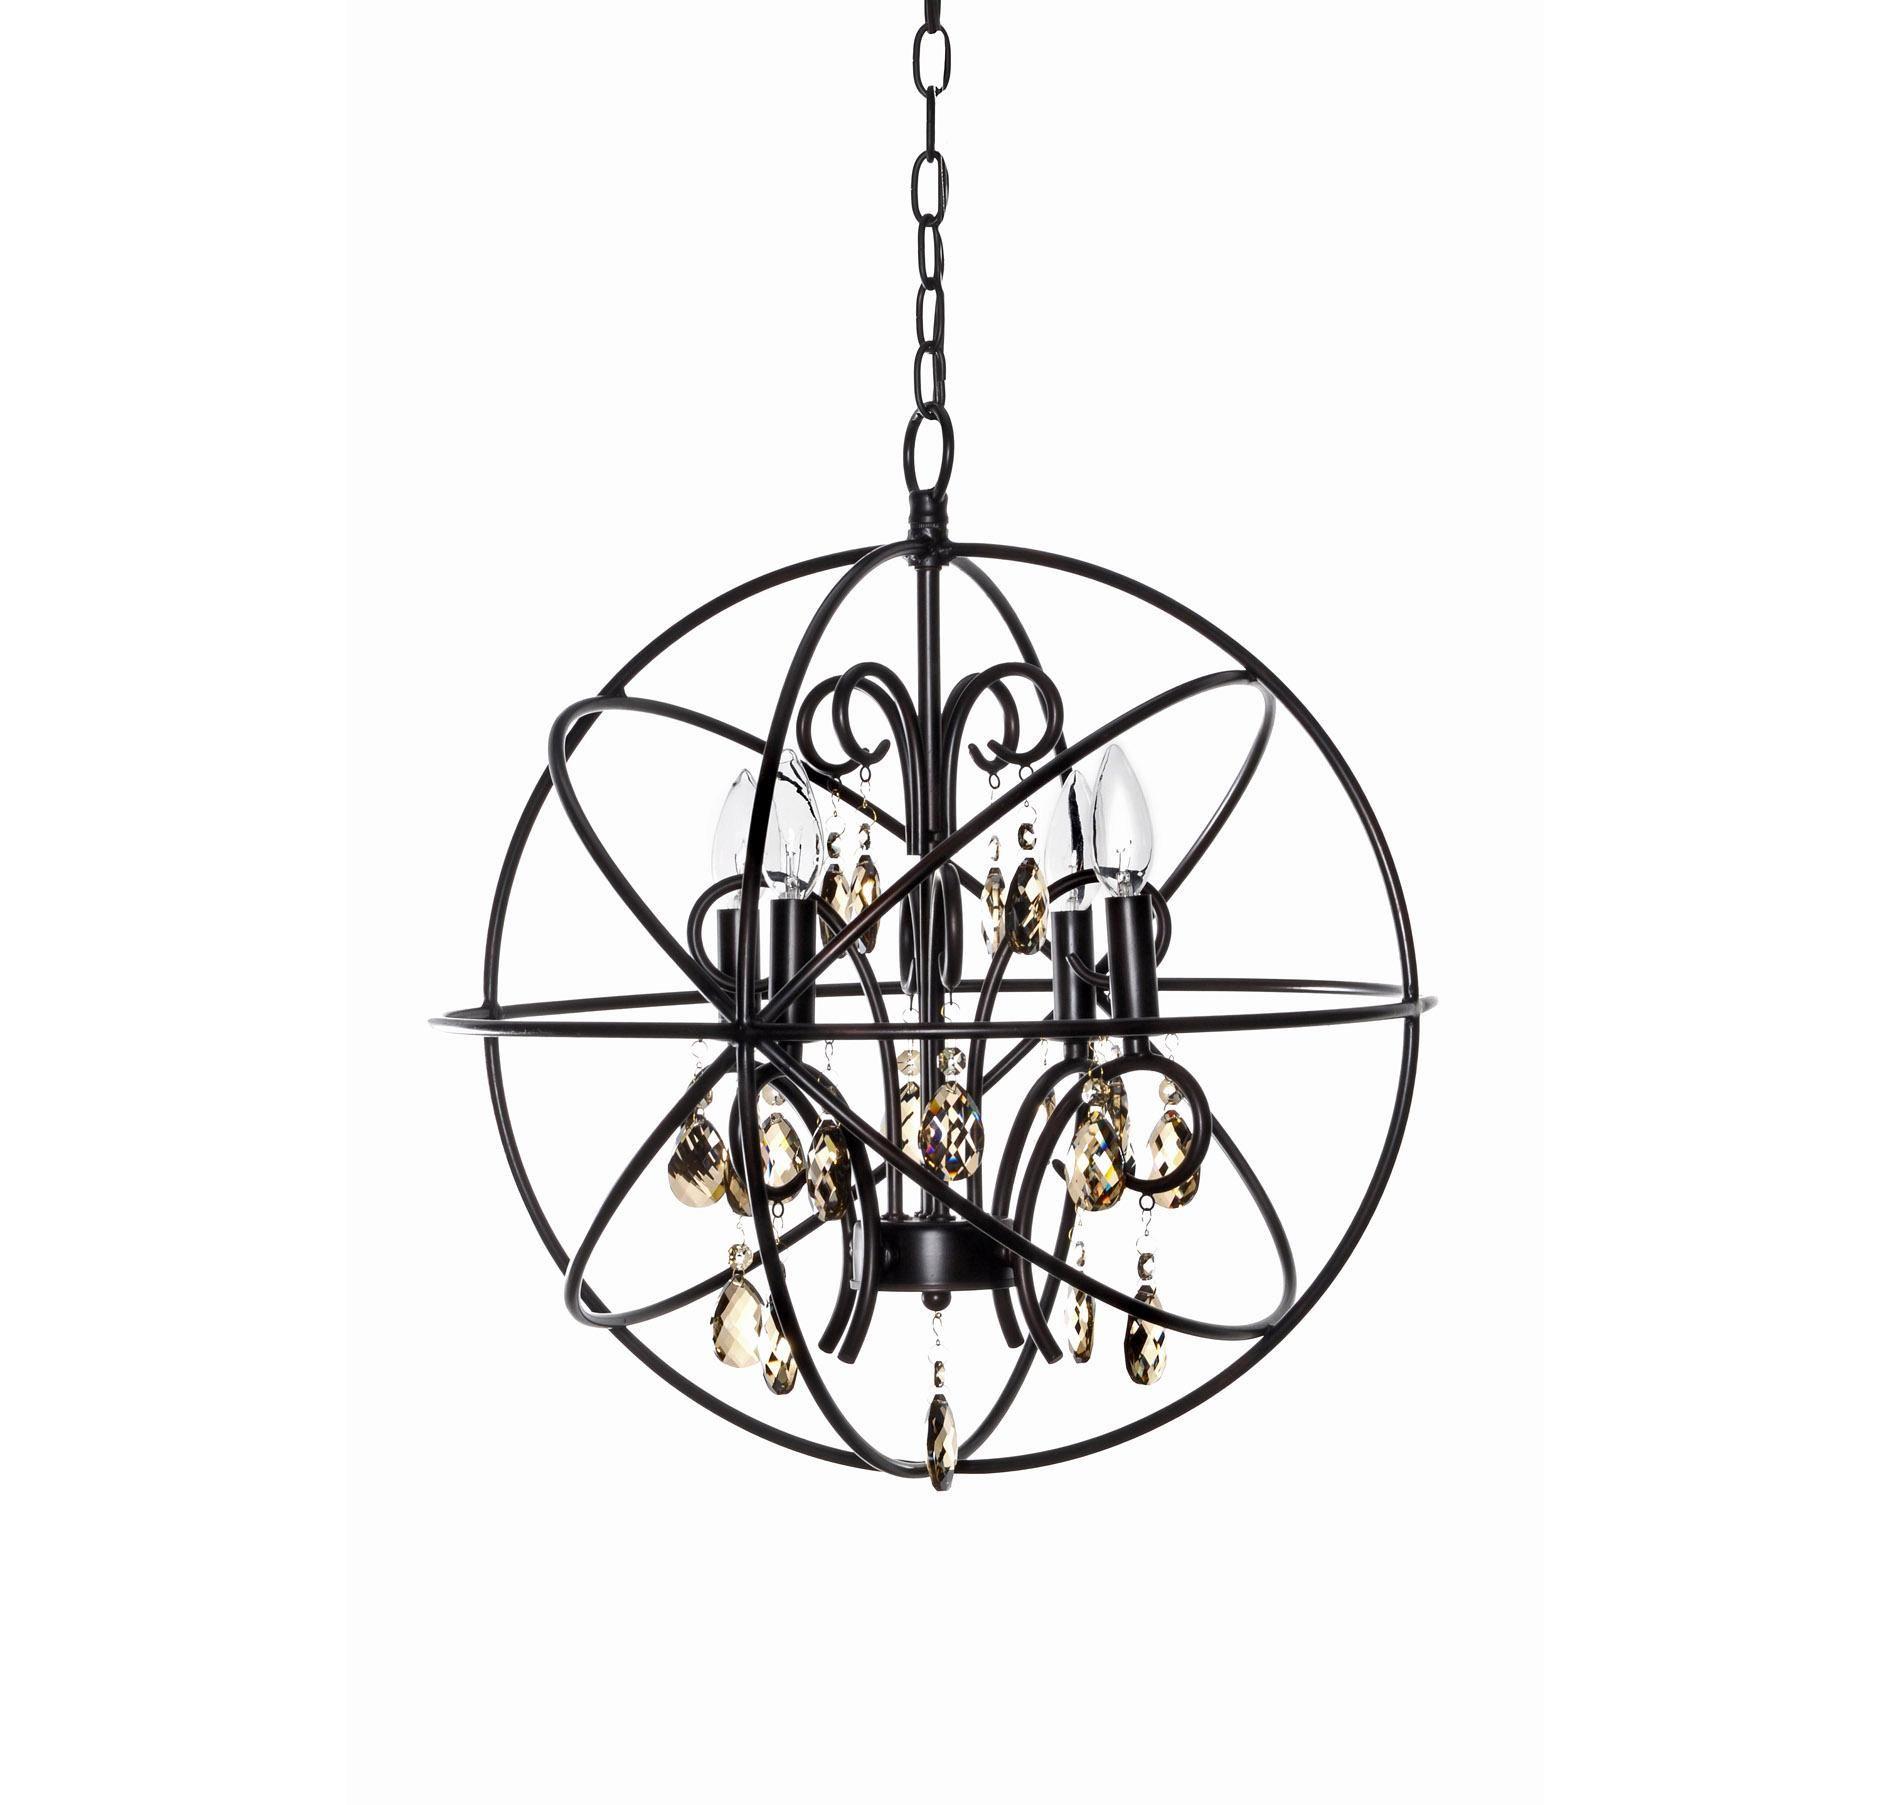 Maxim Lighting Orbit 4 Light Chandelier Oil Rubbed Bronze